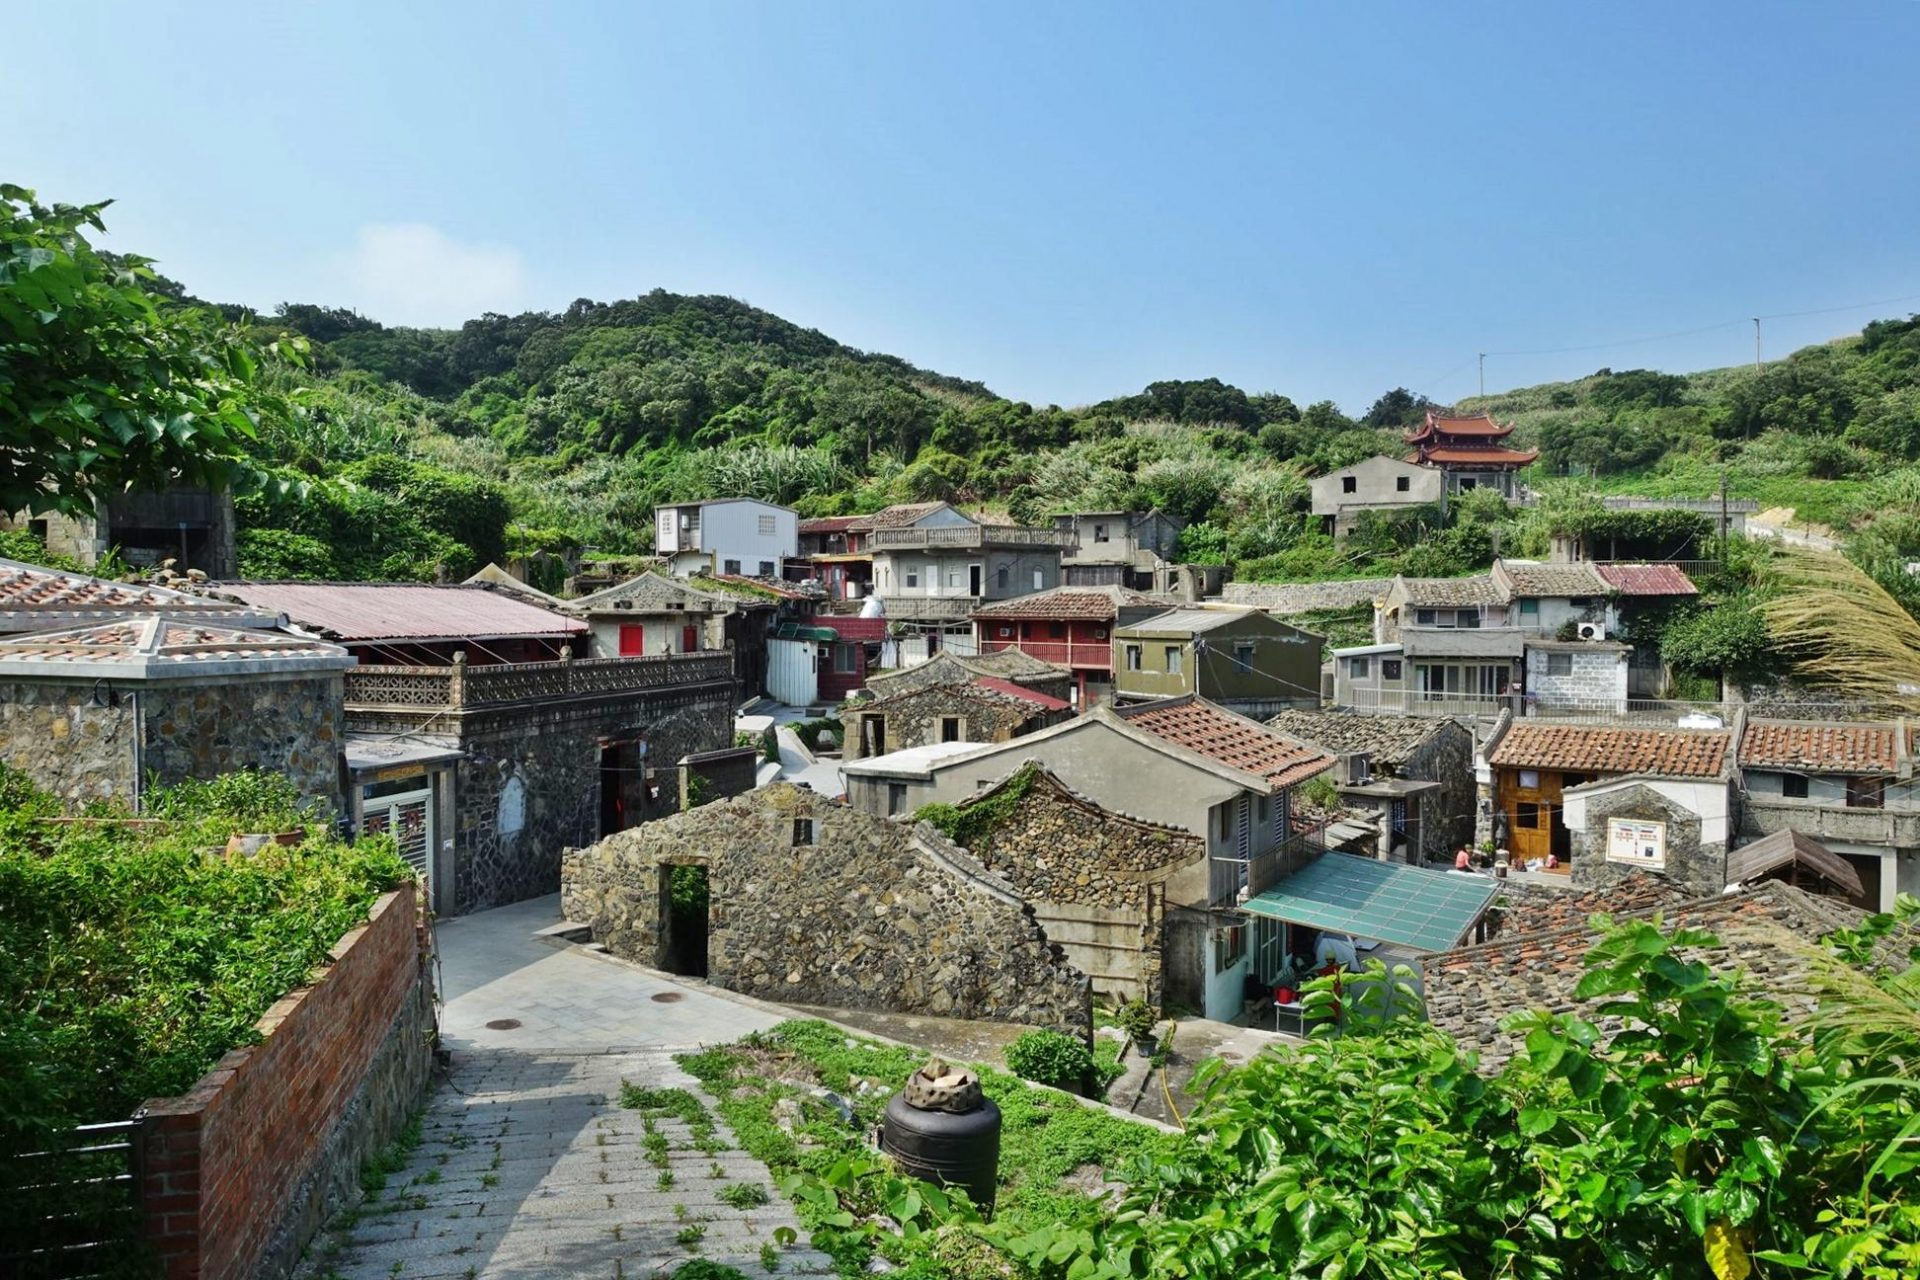 The Tianwo Village in Matsu's Xiju Island. (Image: Courtesy of Chen Kuo-Da)